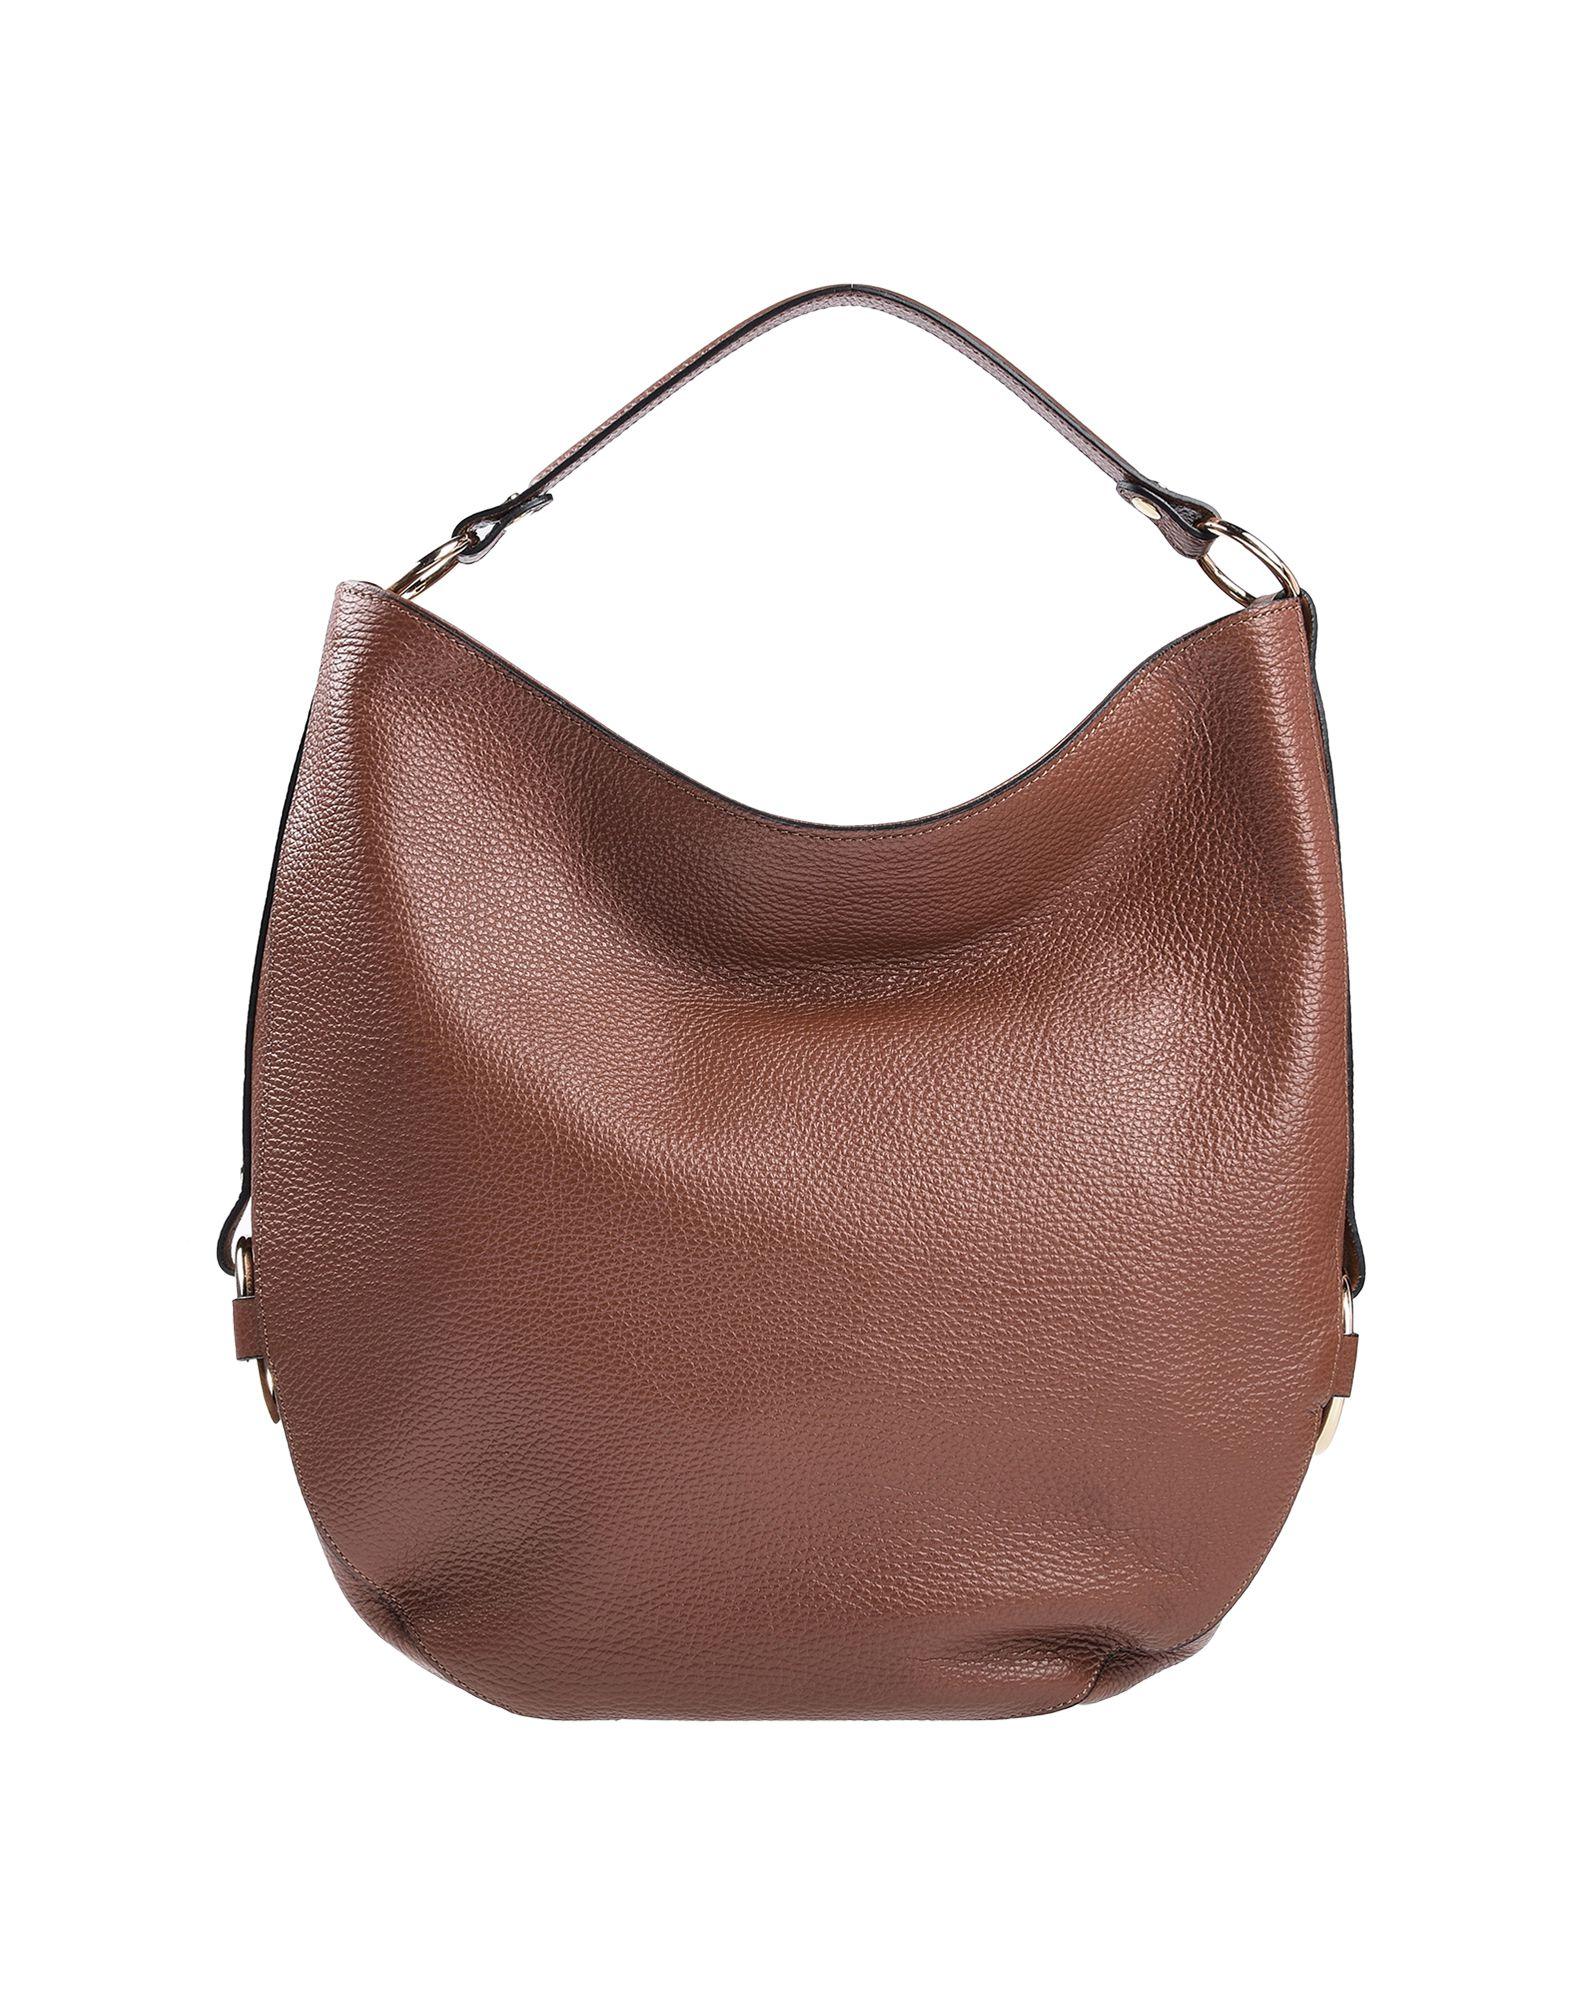 2568a27fb499 innue bag | Compare Prices on GoSale.com